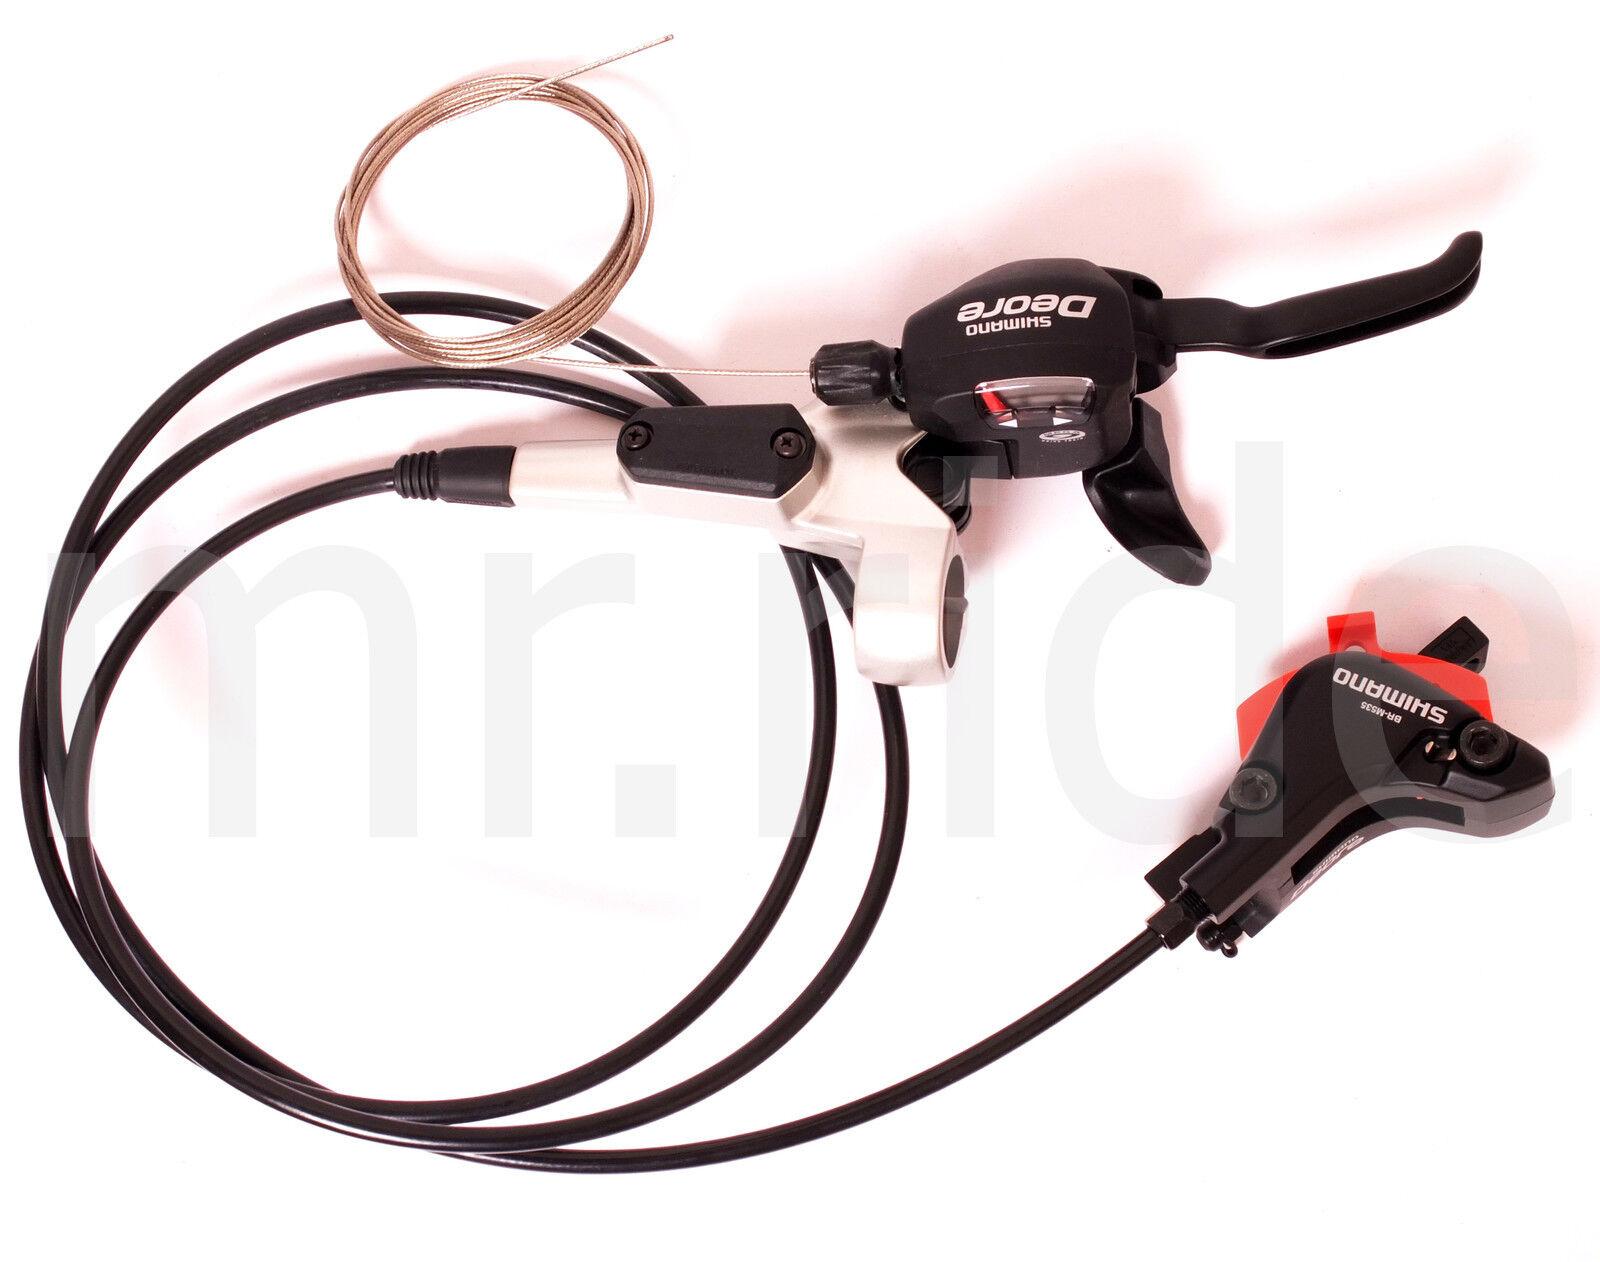 Shimano Deore STM535 Dual Control Shifter, Freno a disco idraulico posteriore argentoo